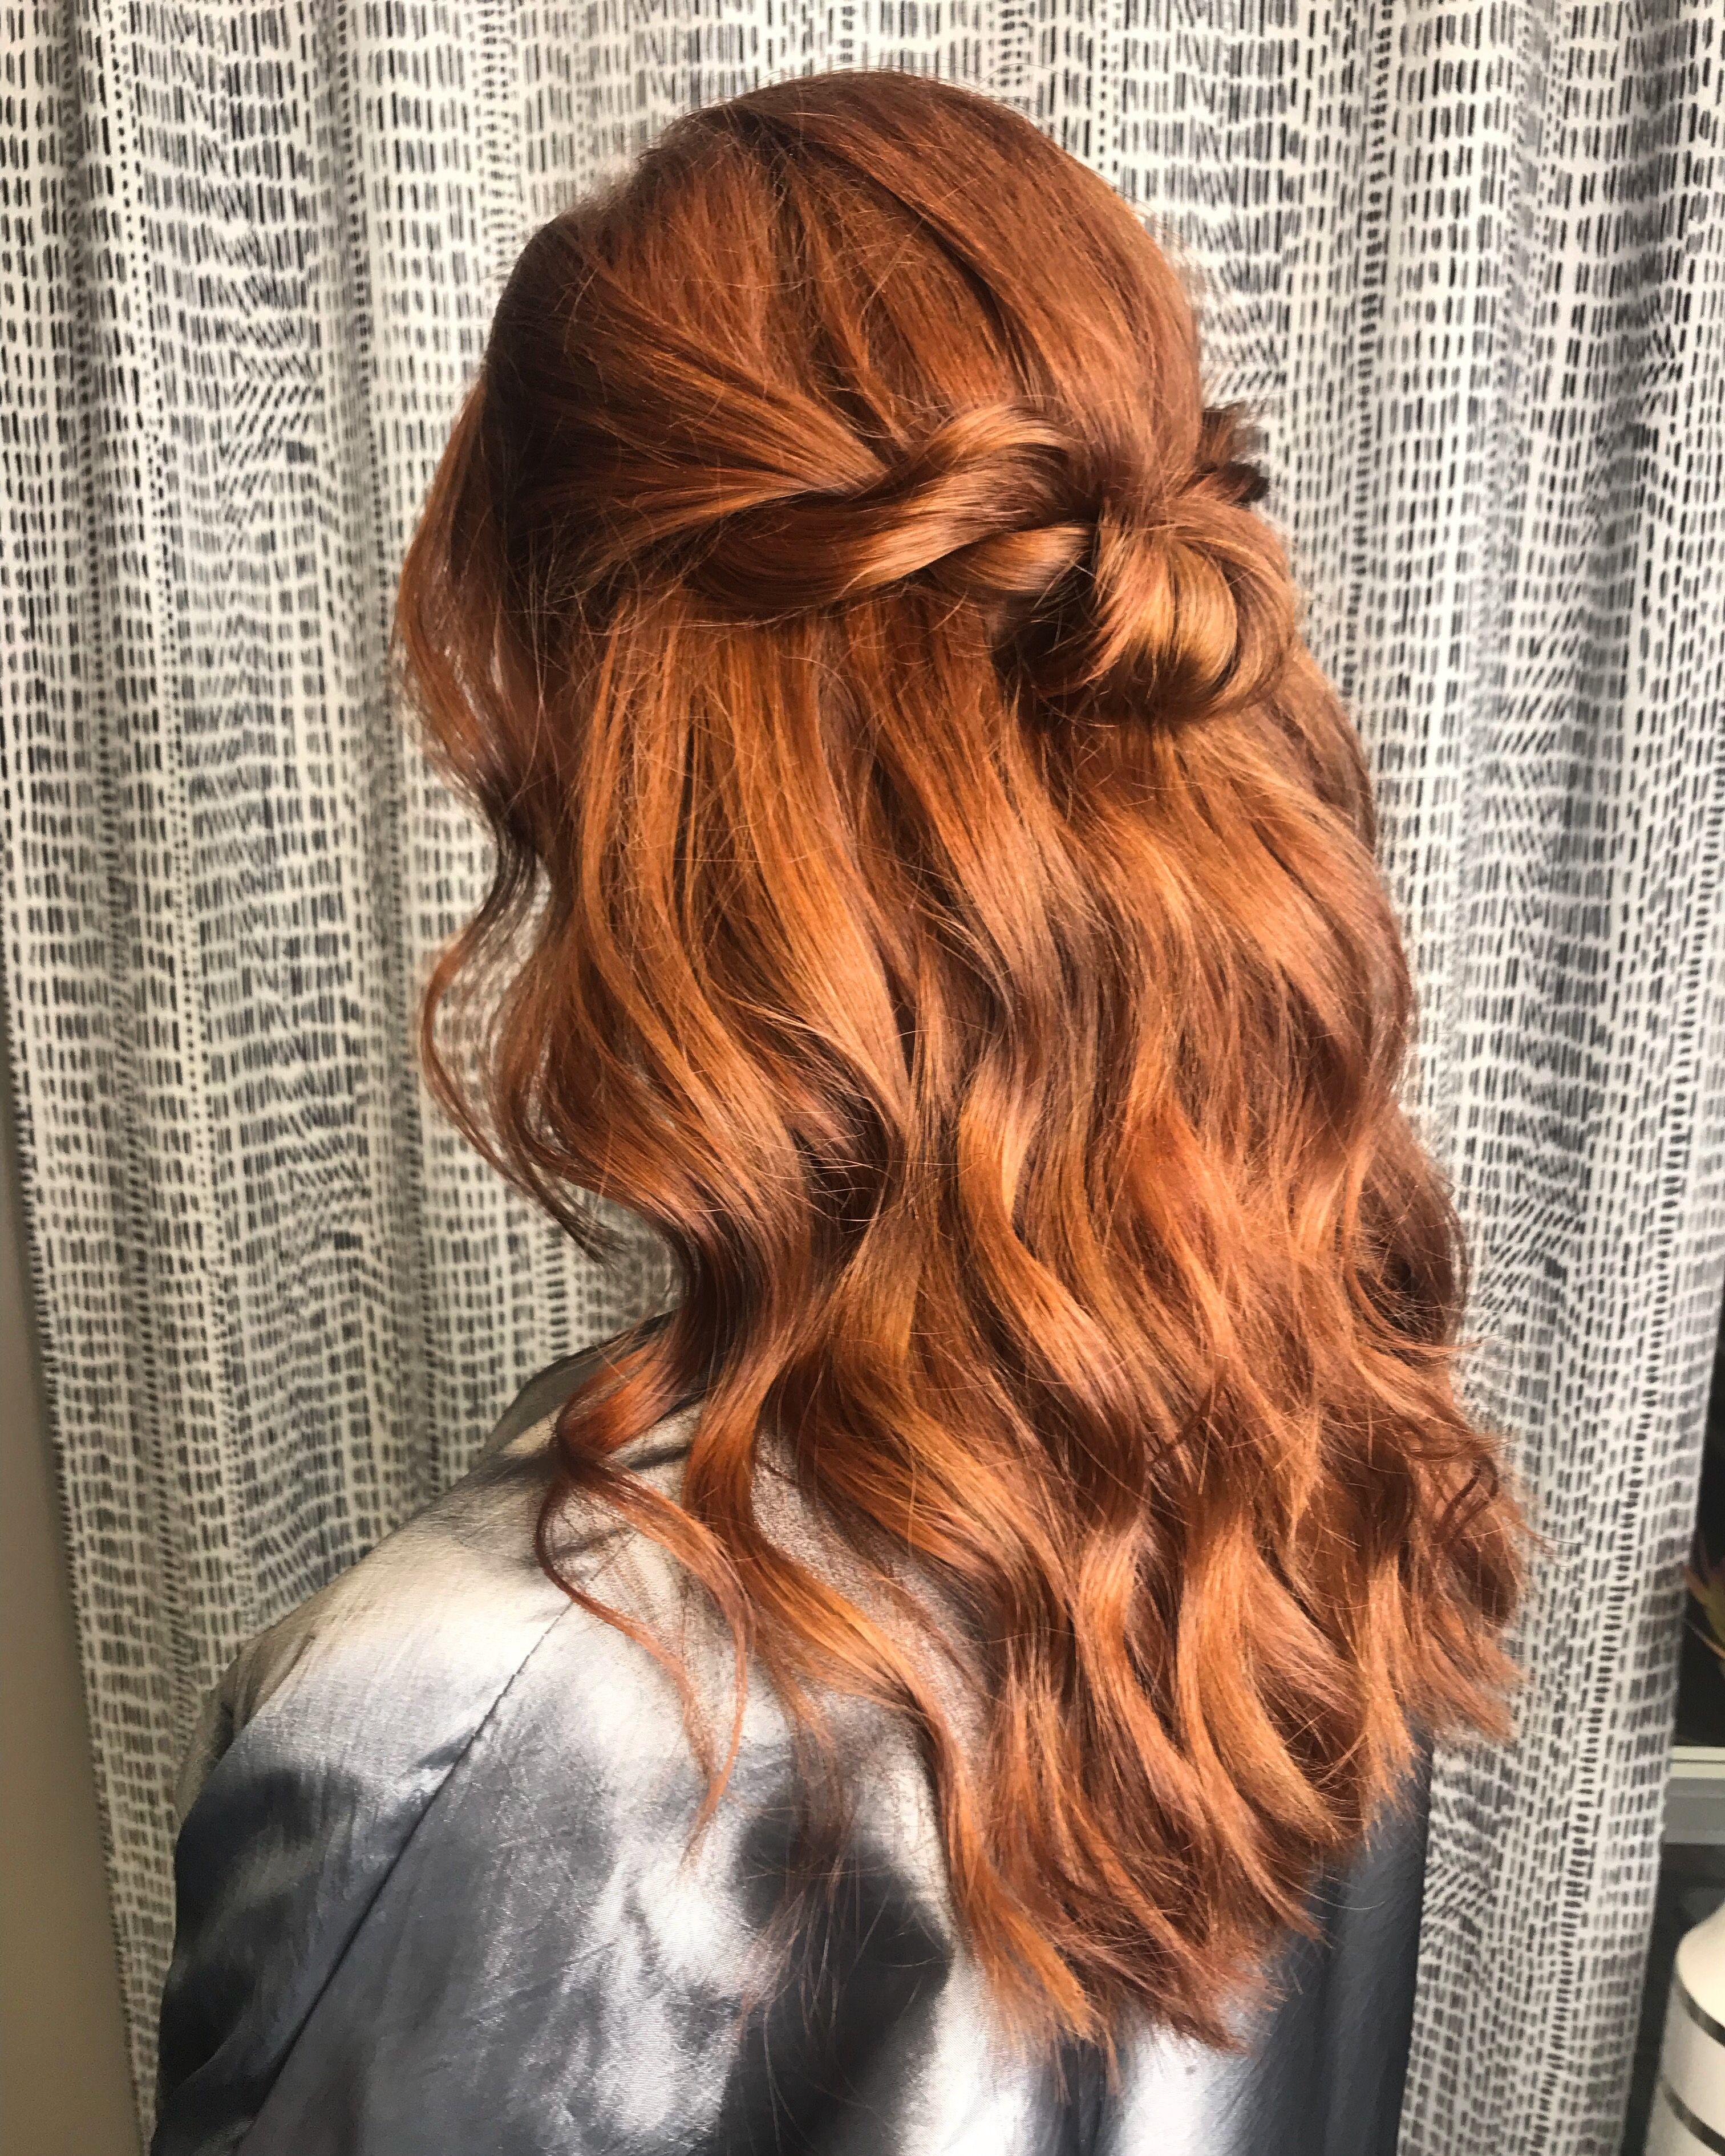 Half Up Half Down Hairstyle In 2020 Half Up Half Down Hair Wedding Hairstyles Half Up Half Down Half Up Hair